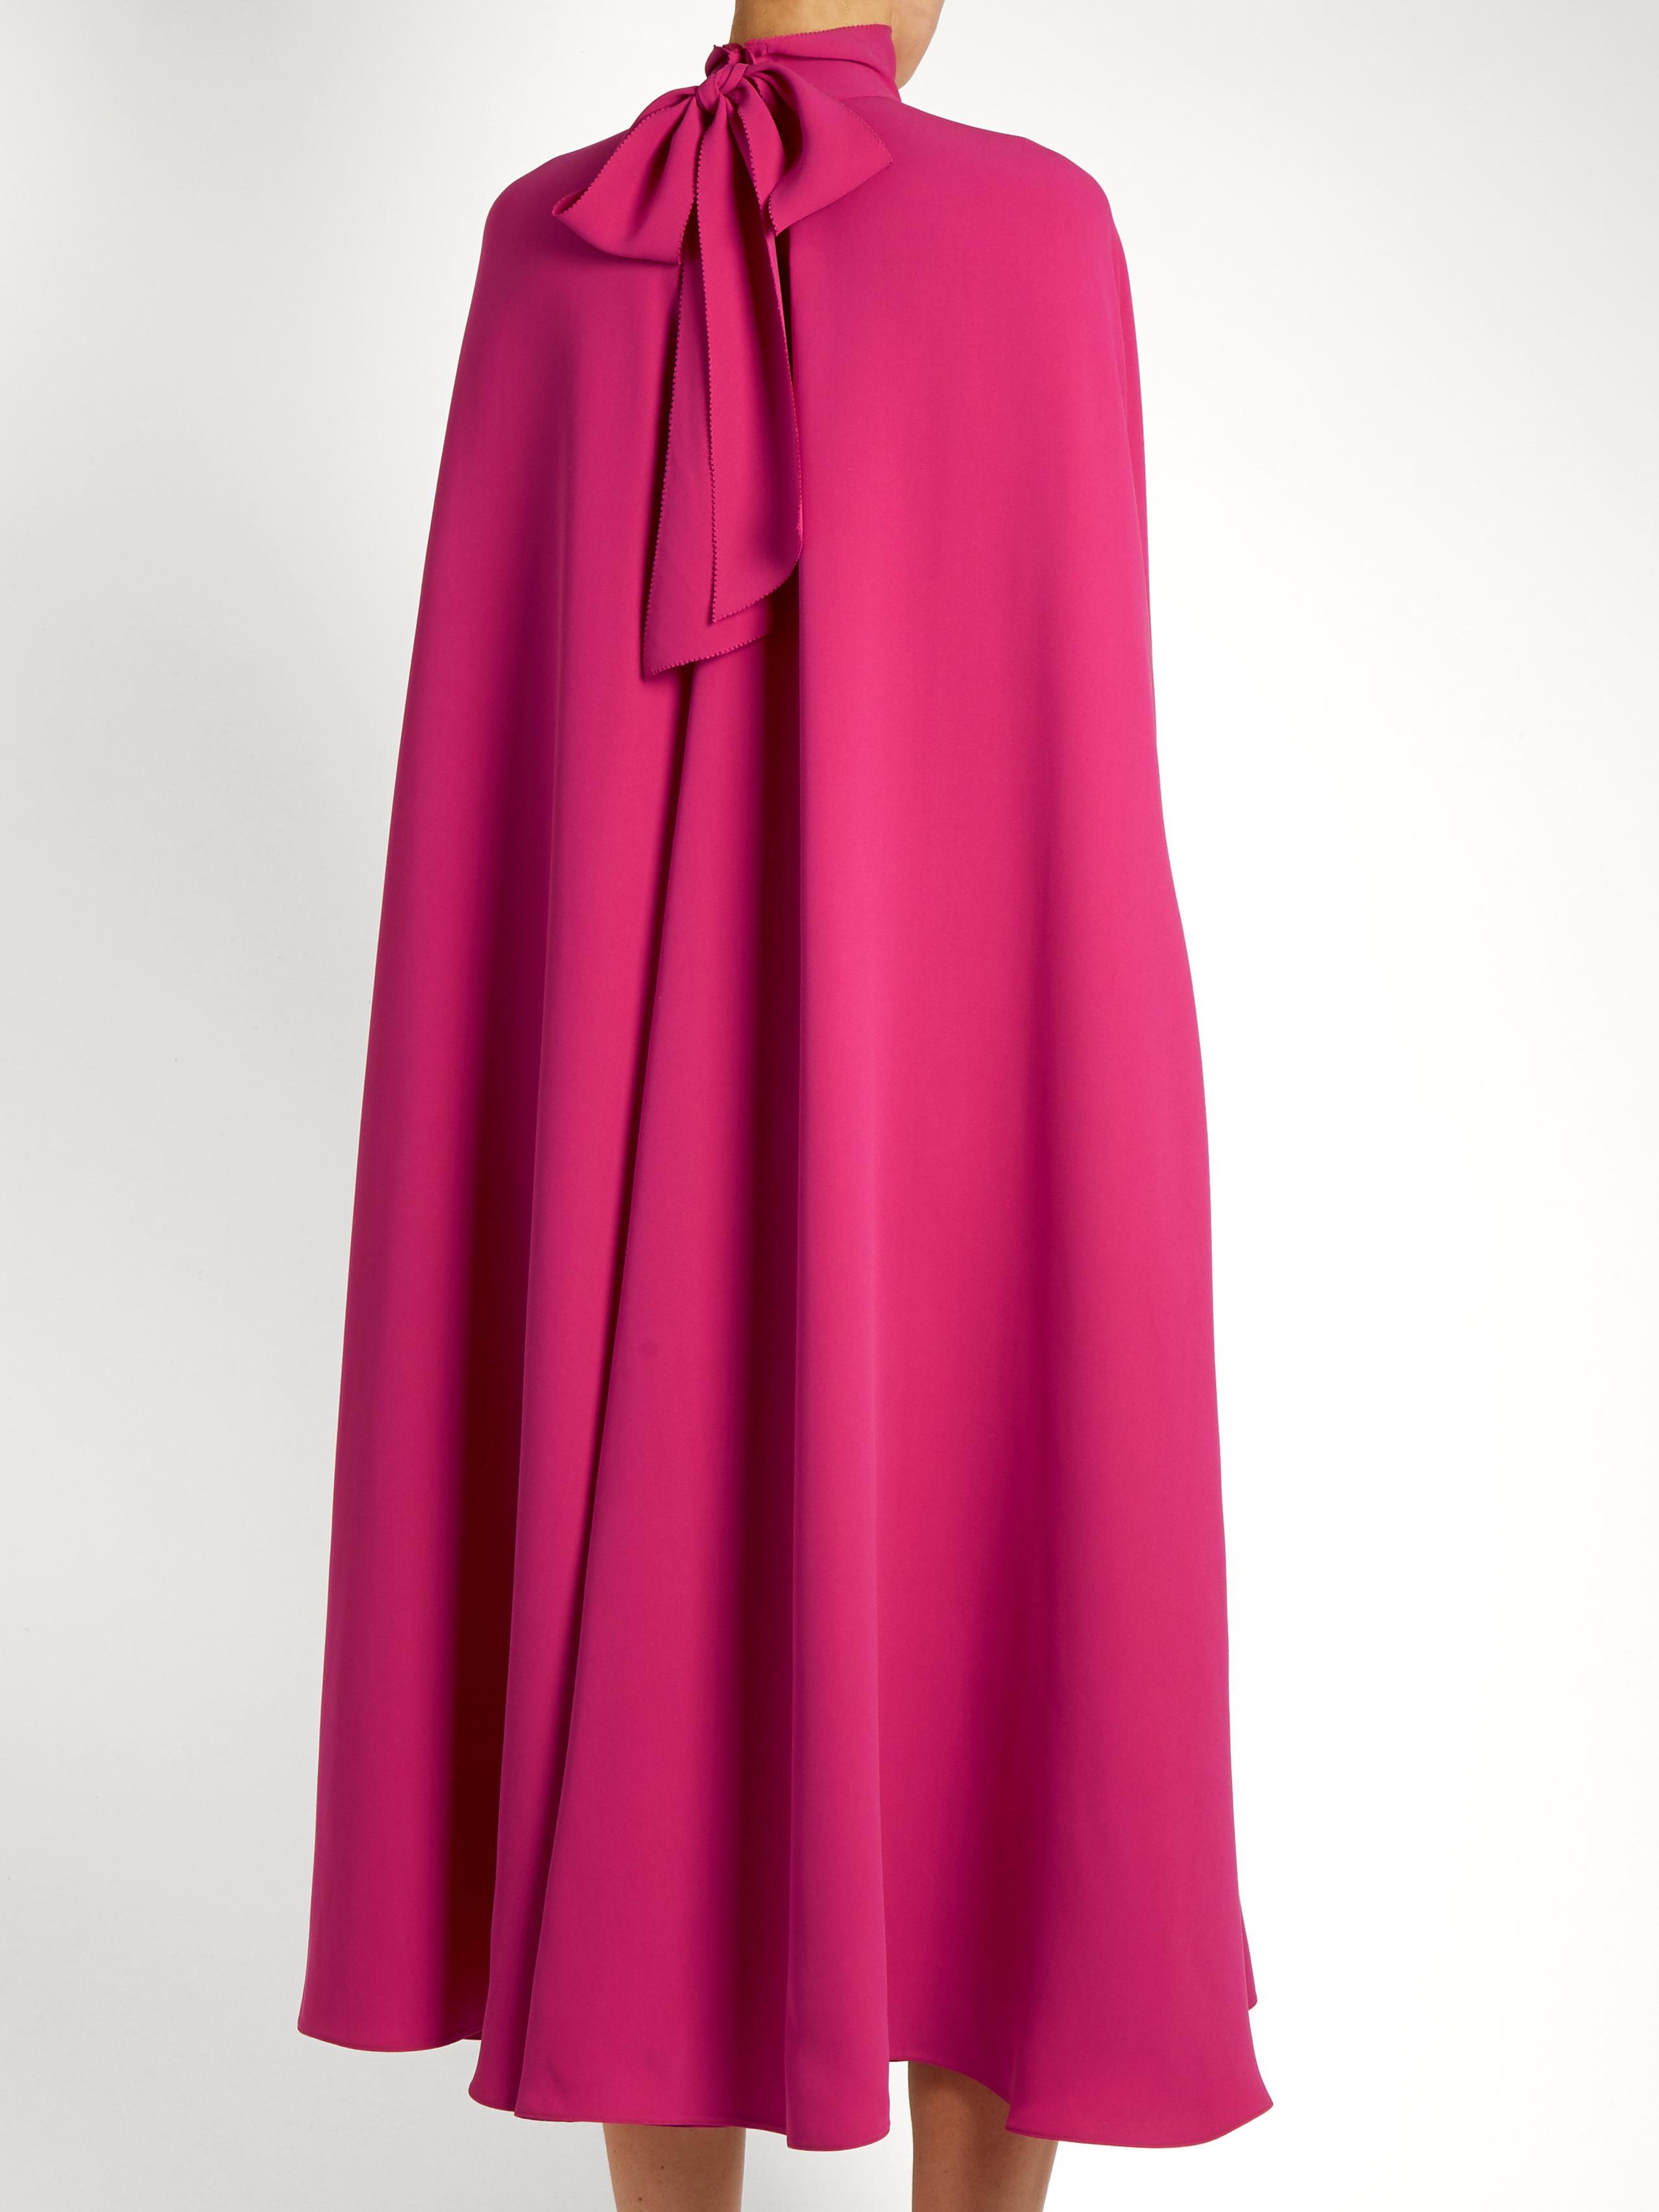 01989488f2 Valentino Pink Silk Cape Dress